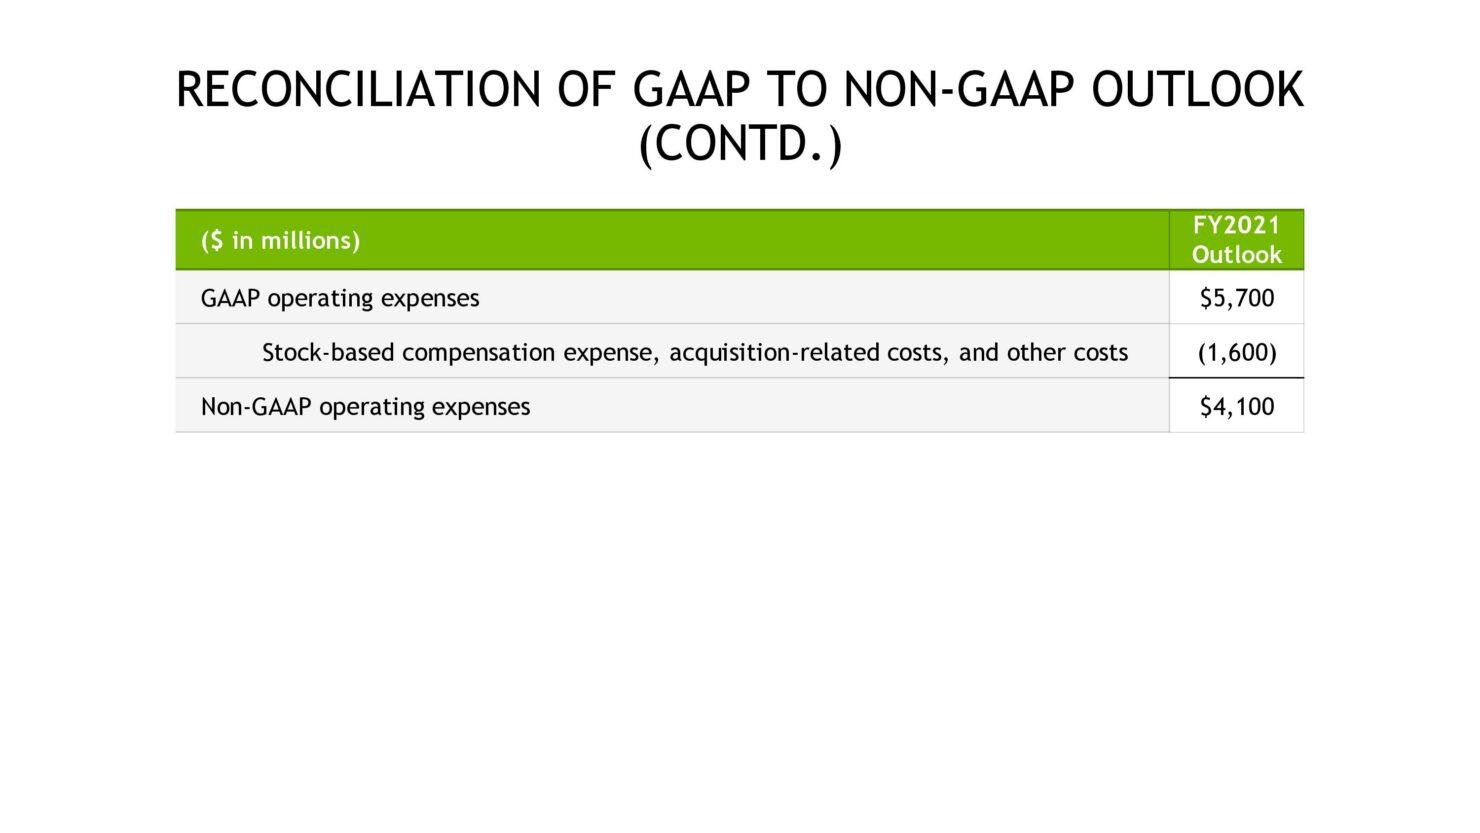 nvda-1qfy21-investor-presentation-5-21-20-final-page-048